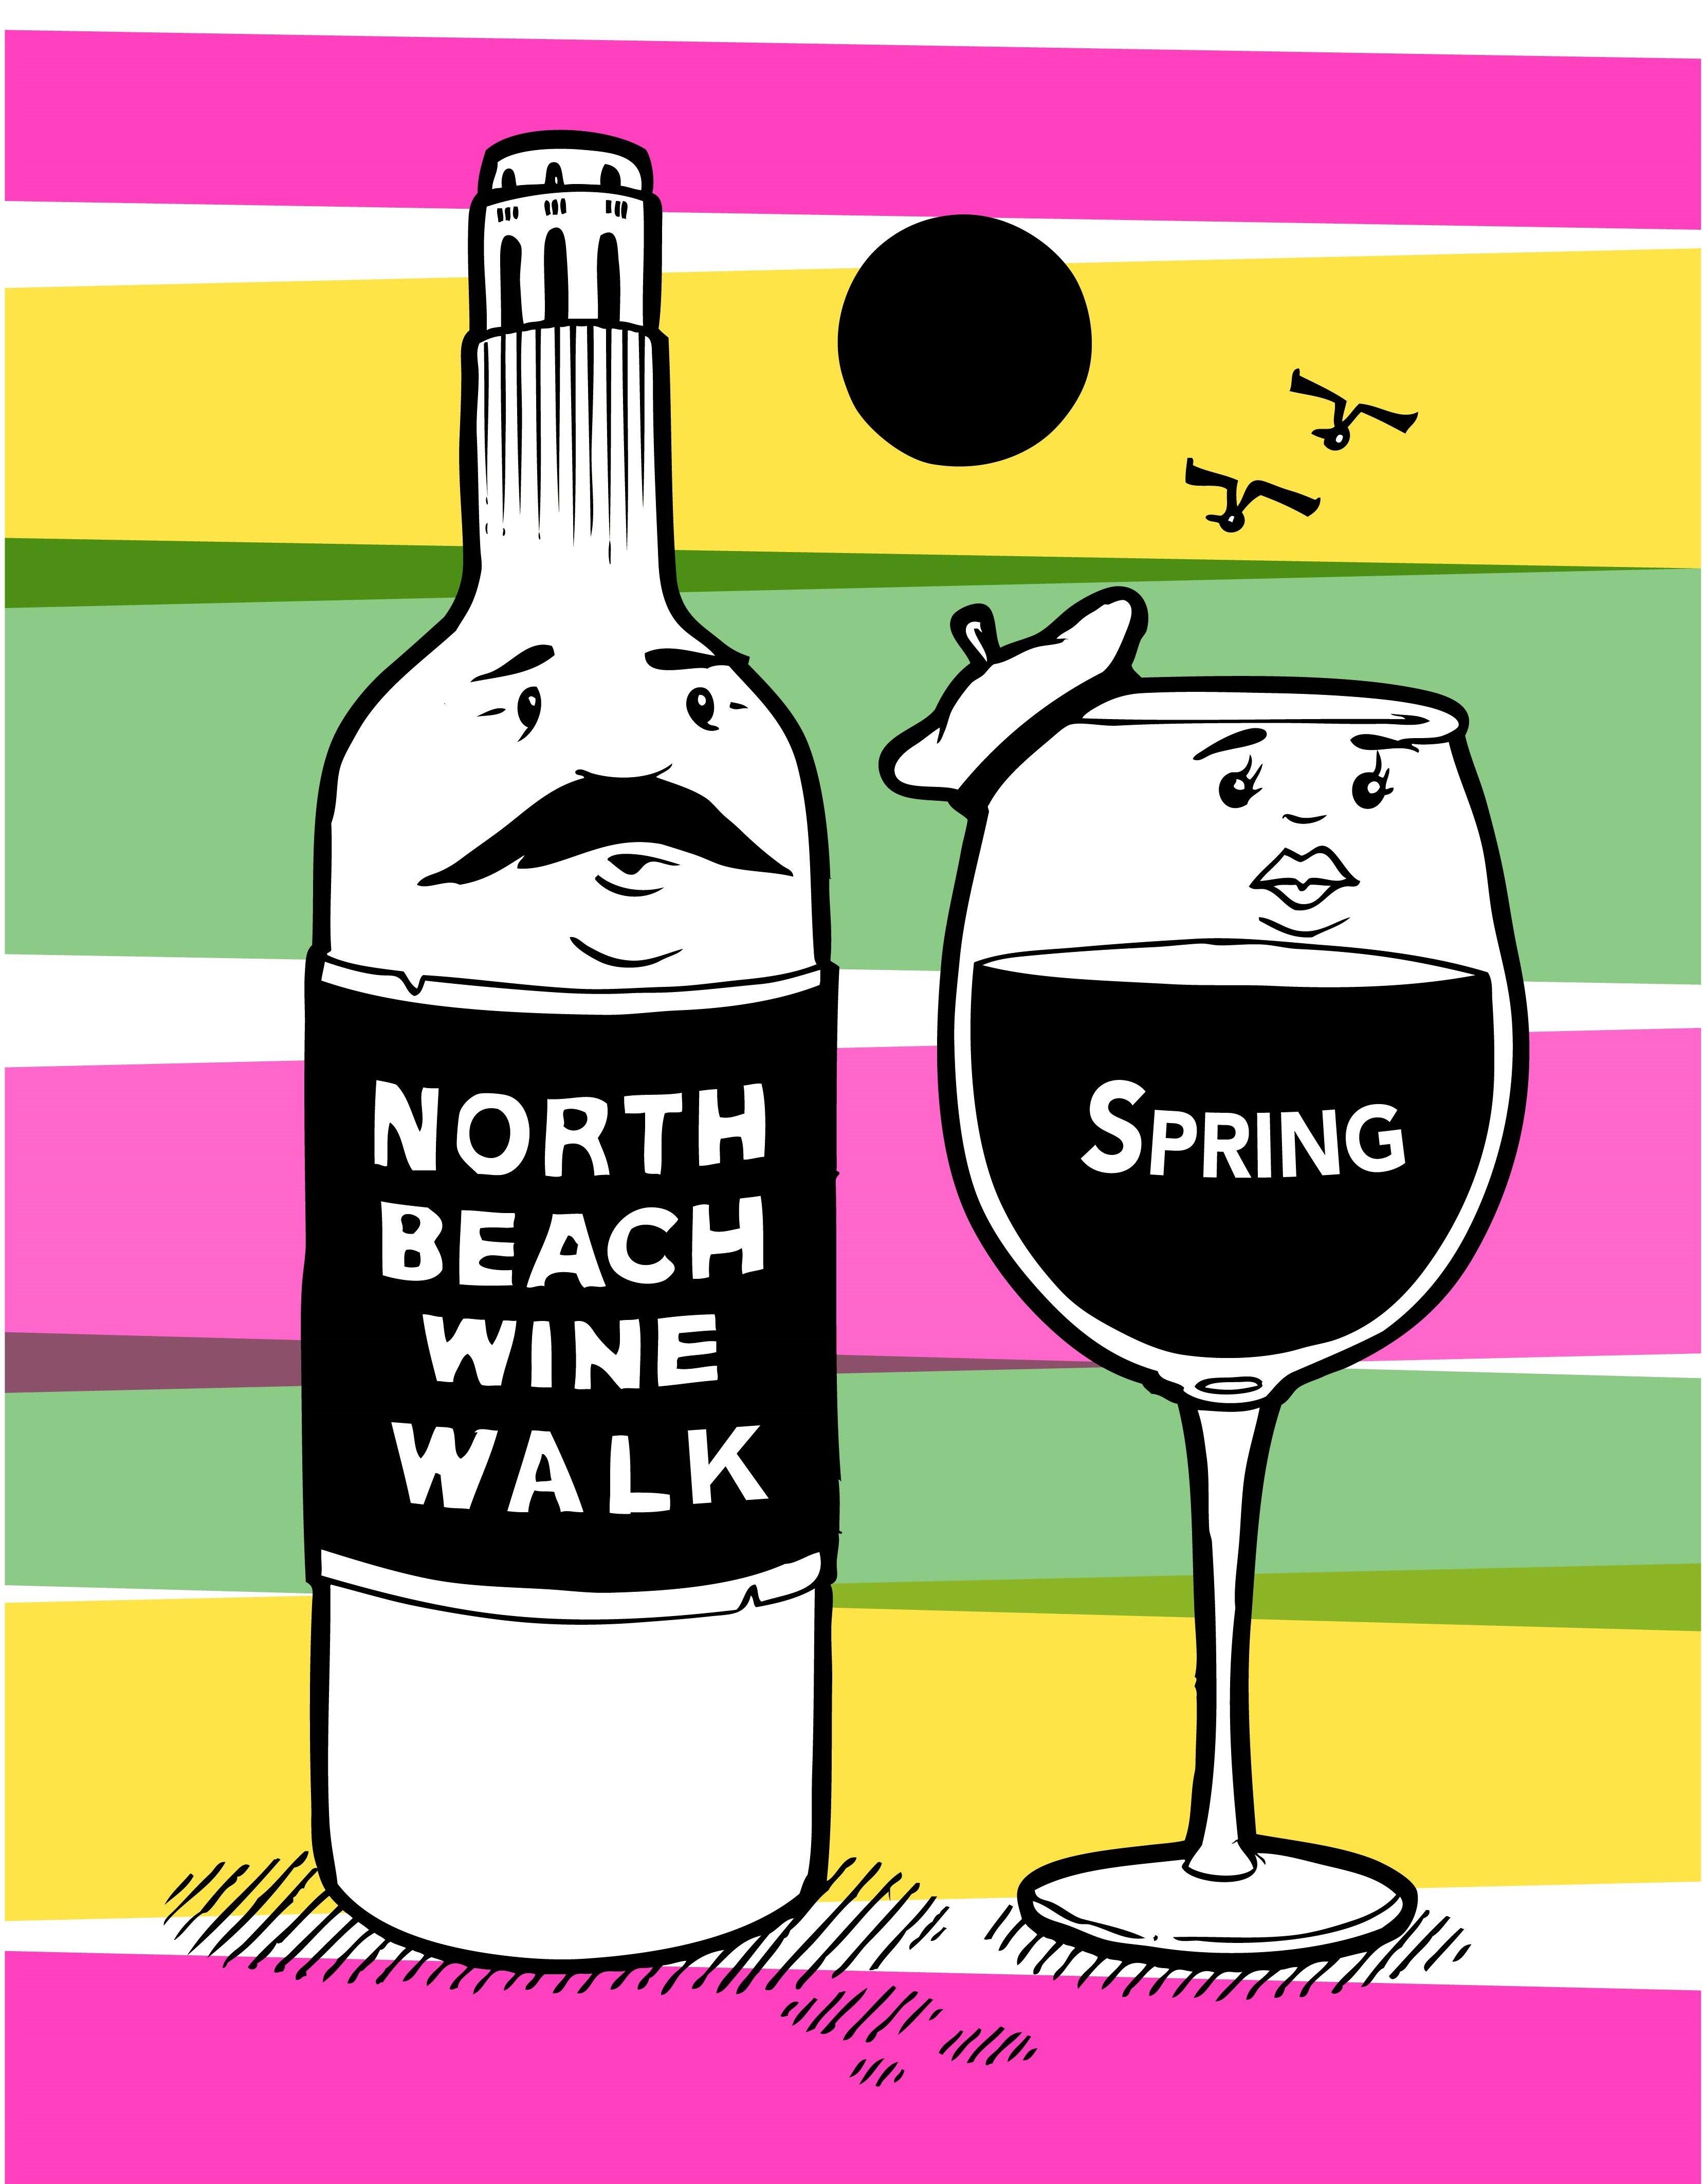 North Beach Wine Walk